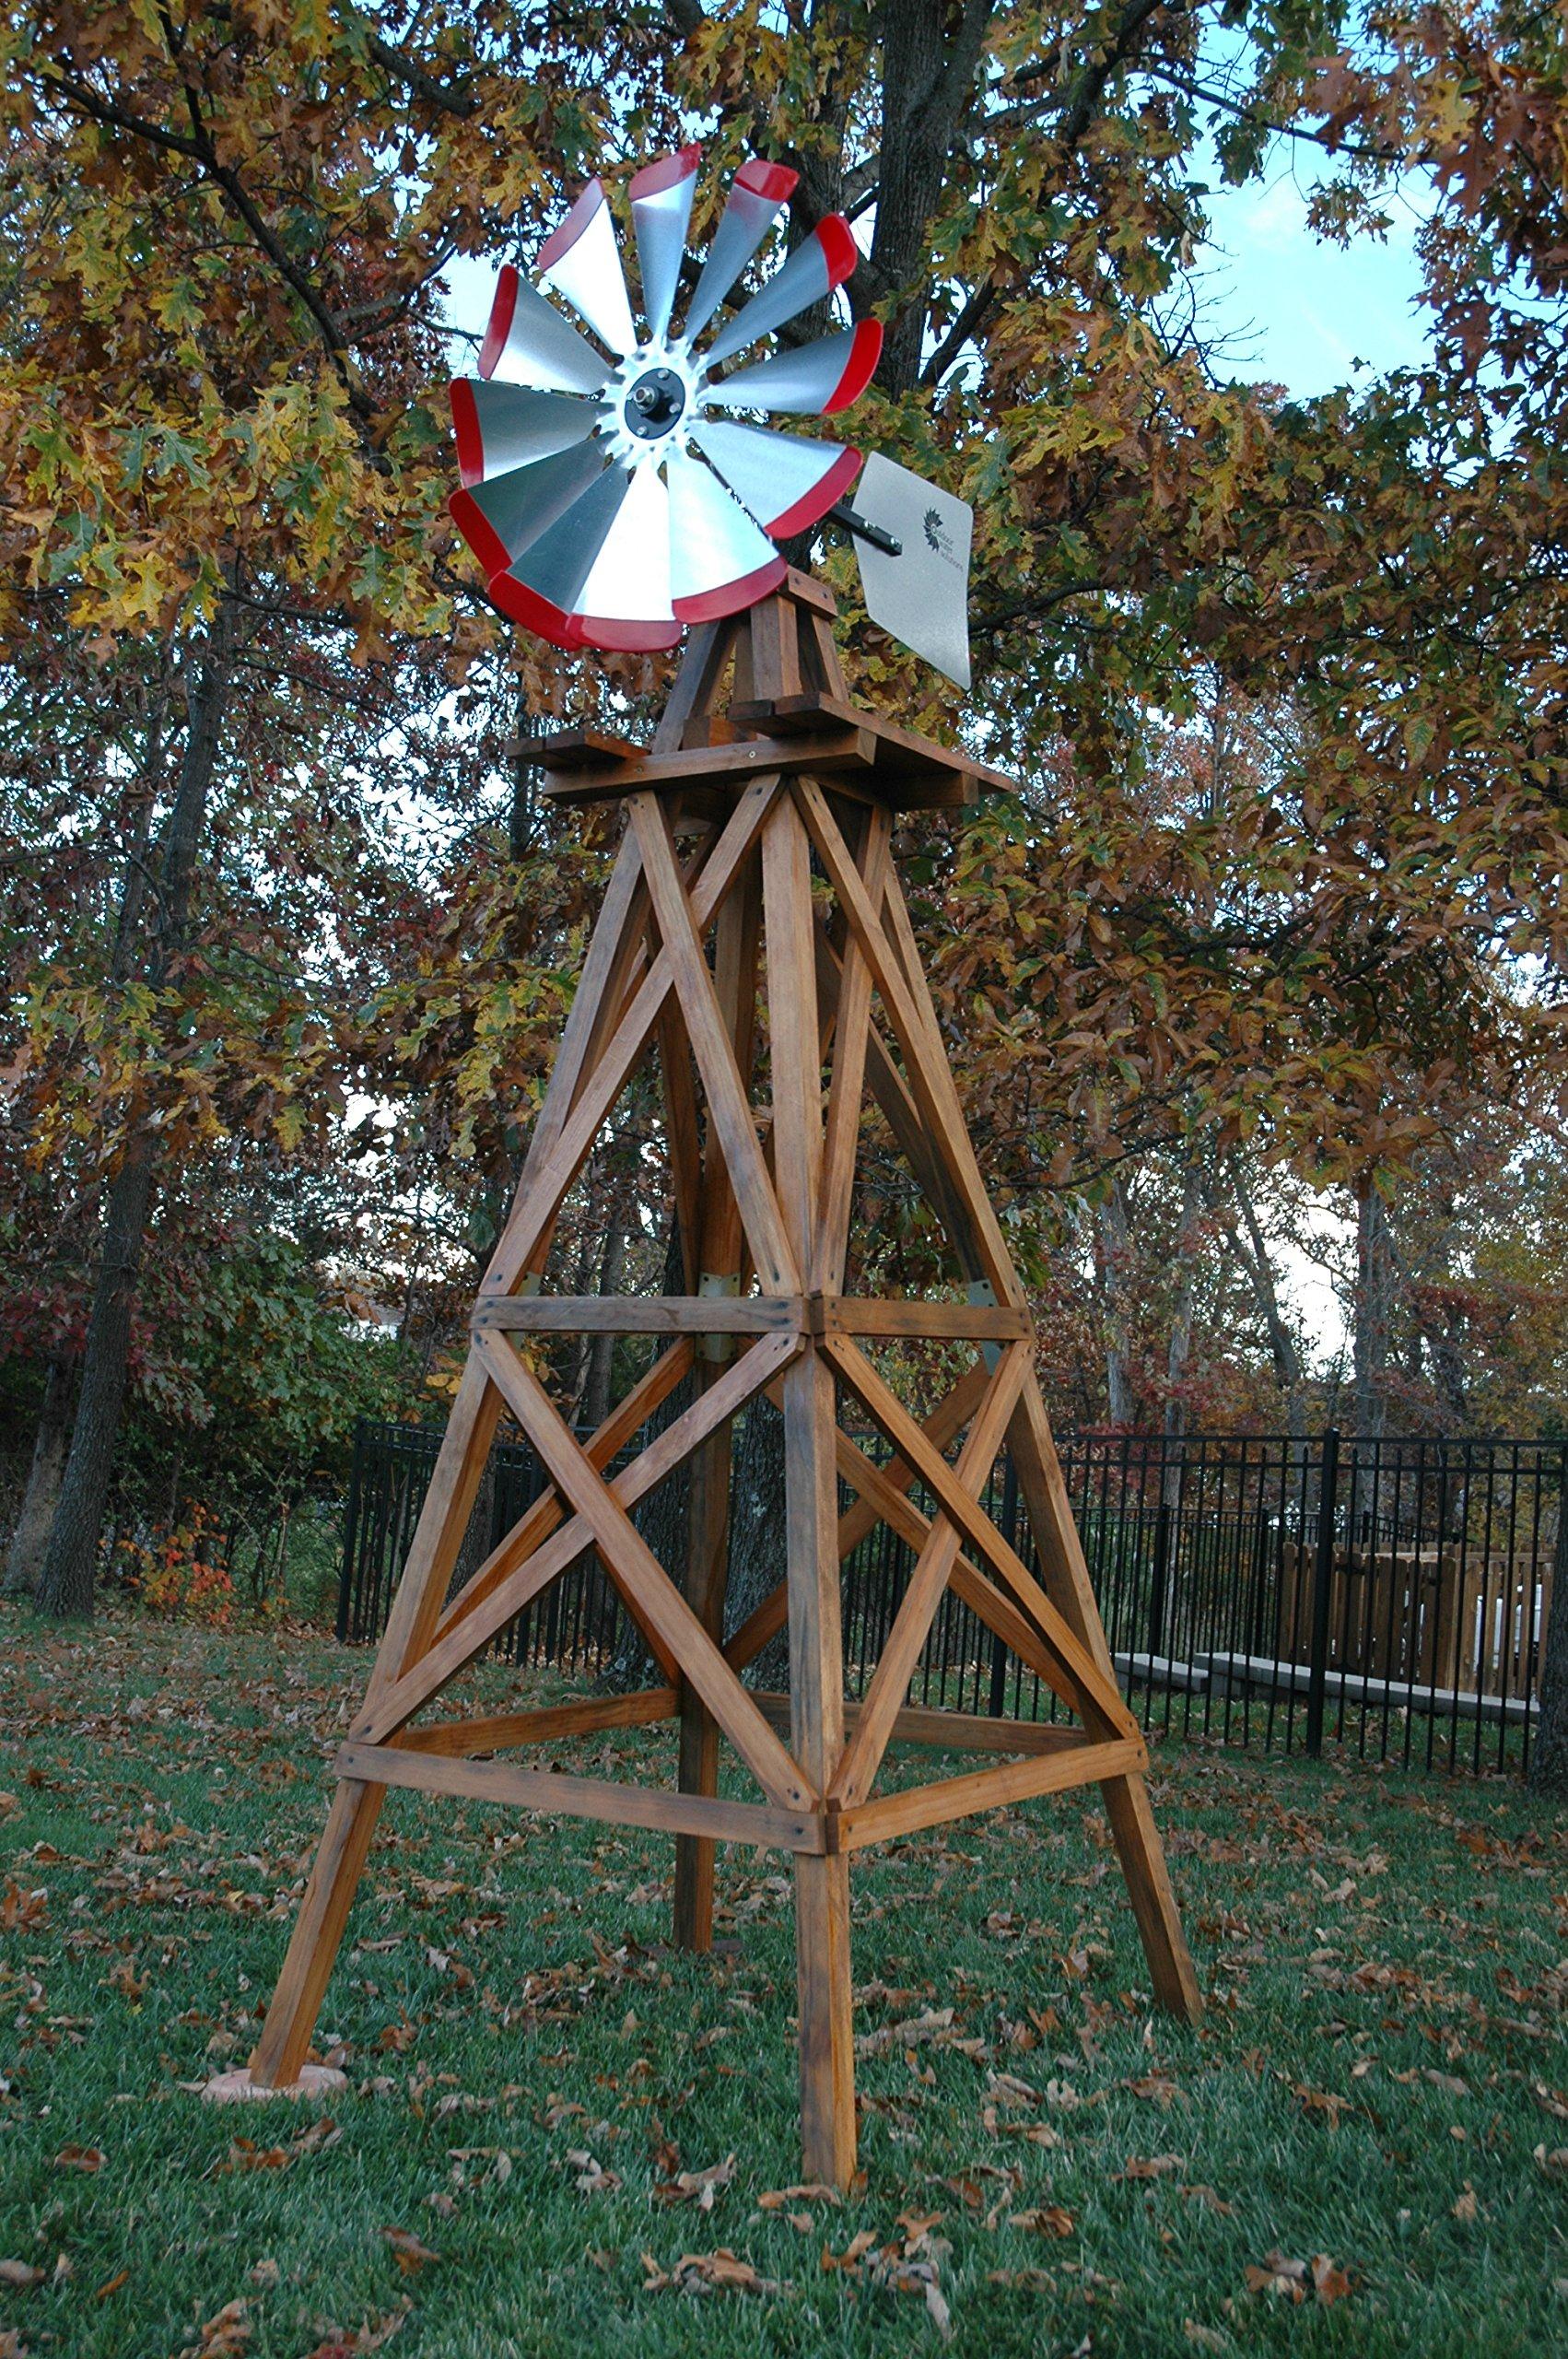 Outdoor Water Solutions BYW0136 10-Feet Wood Backyard Windmill by Outdoor Water Solutions